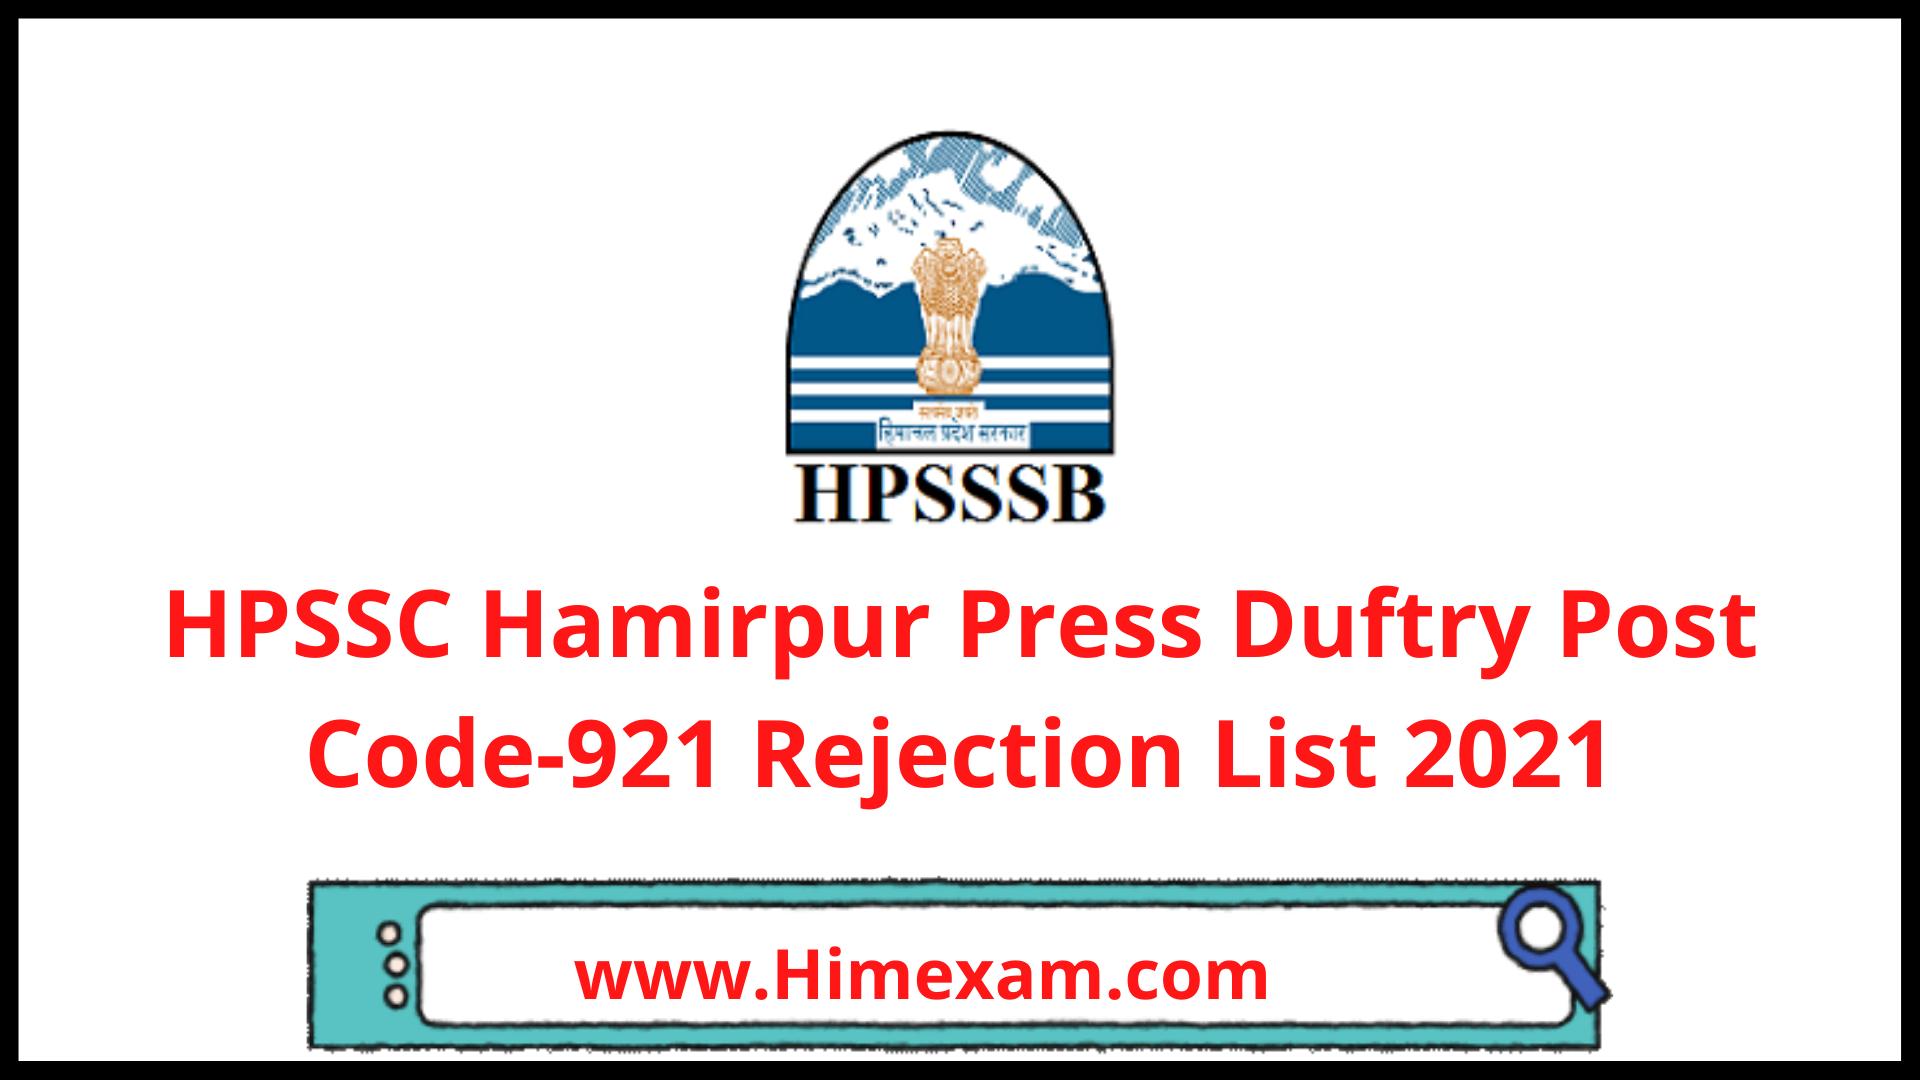 HPSSC Hamirpur Press Duftry Post Code-921 Rejection List 2021